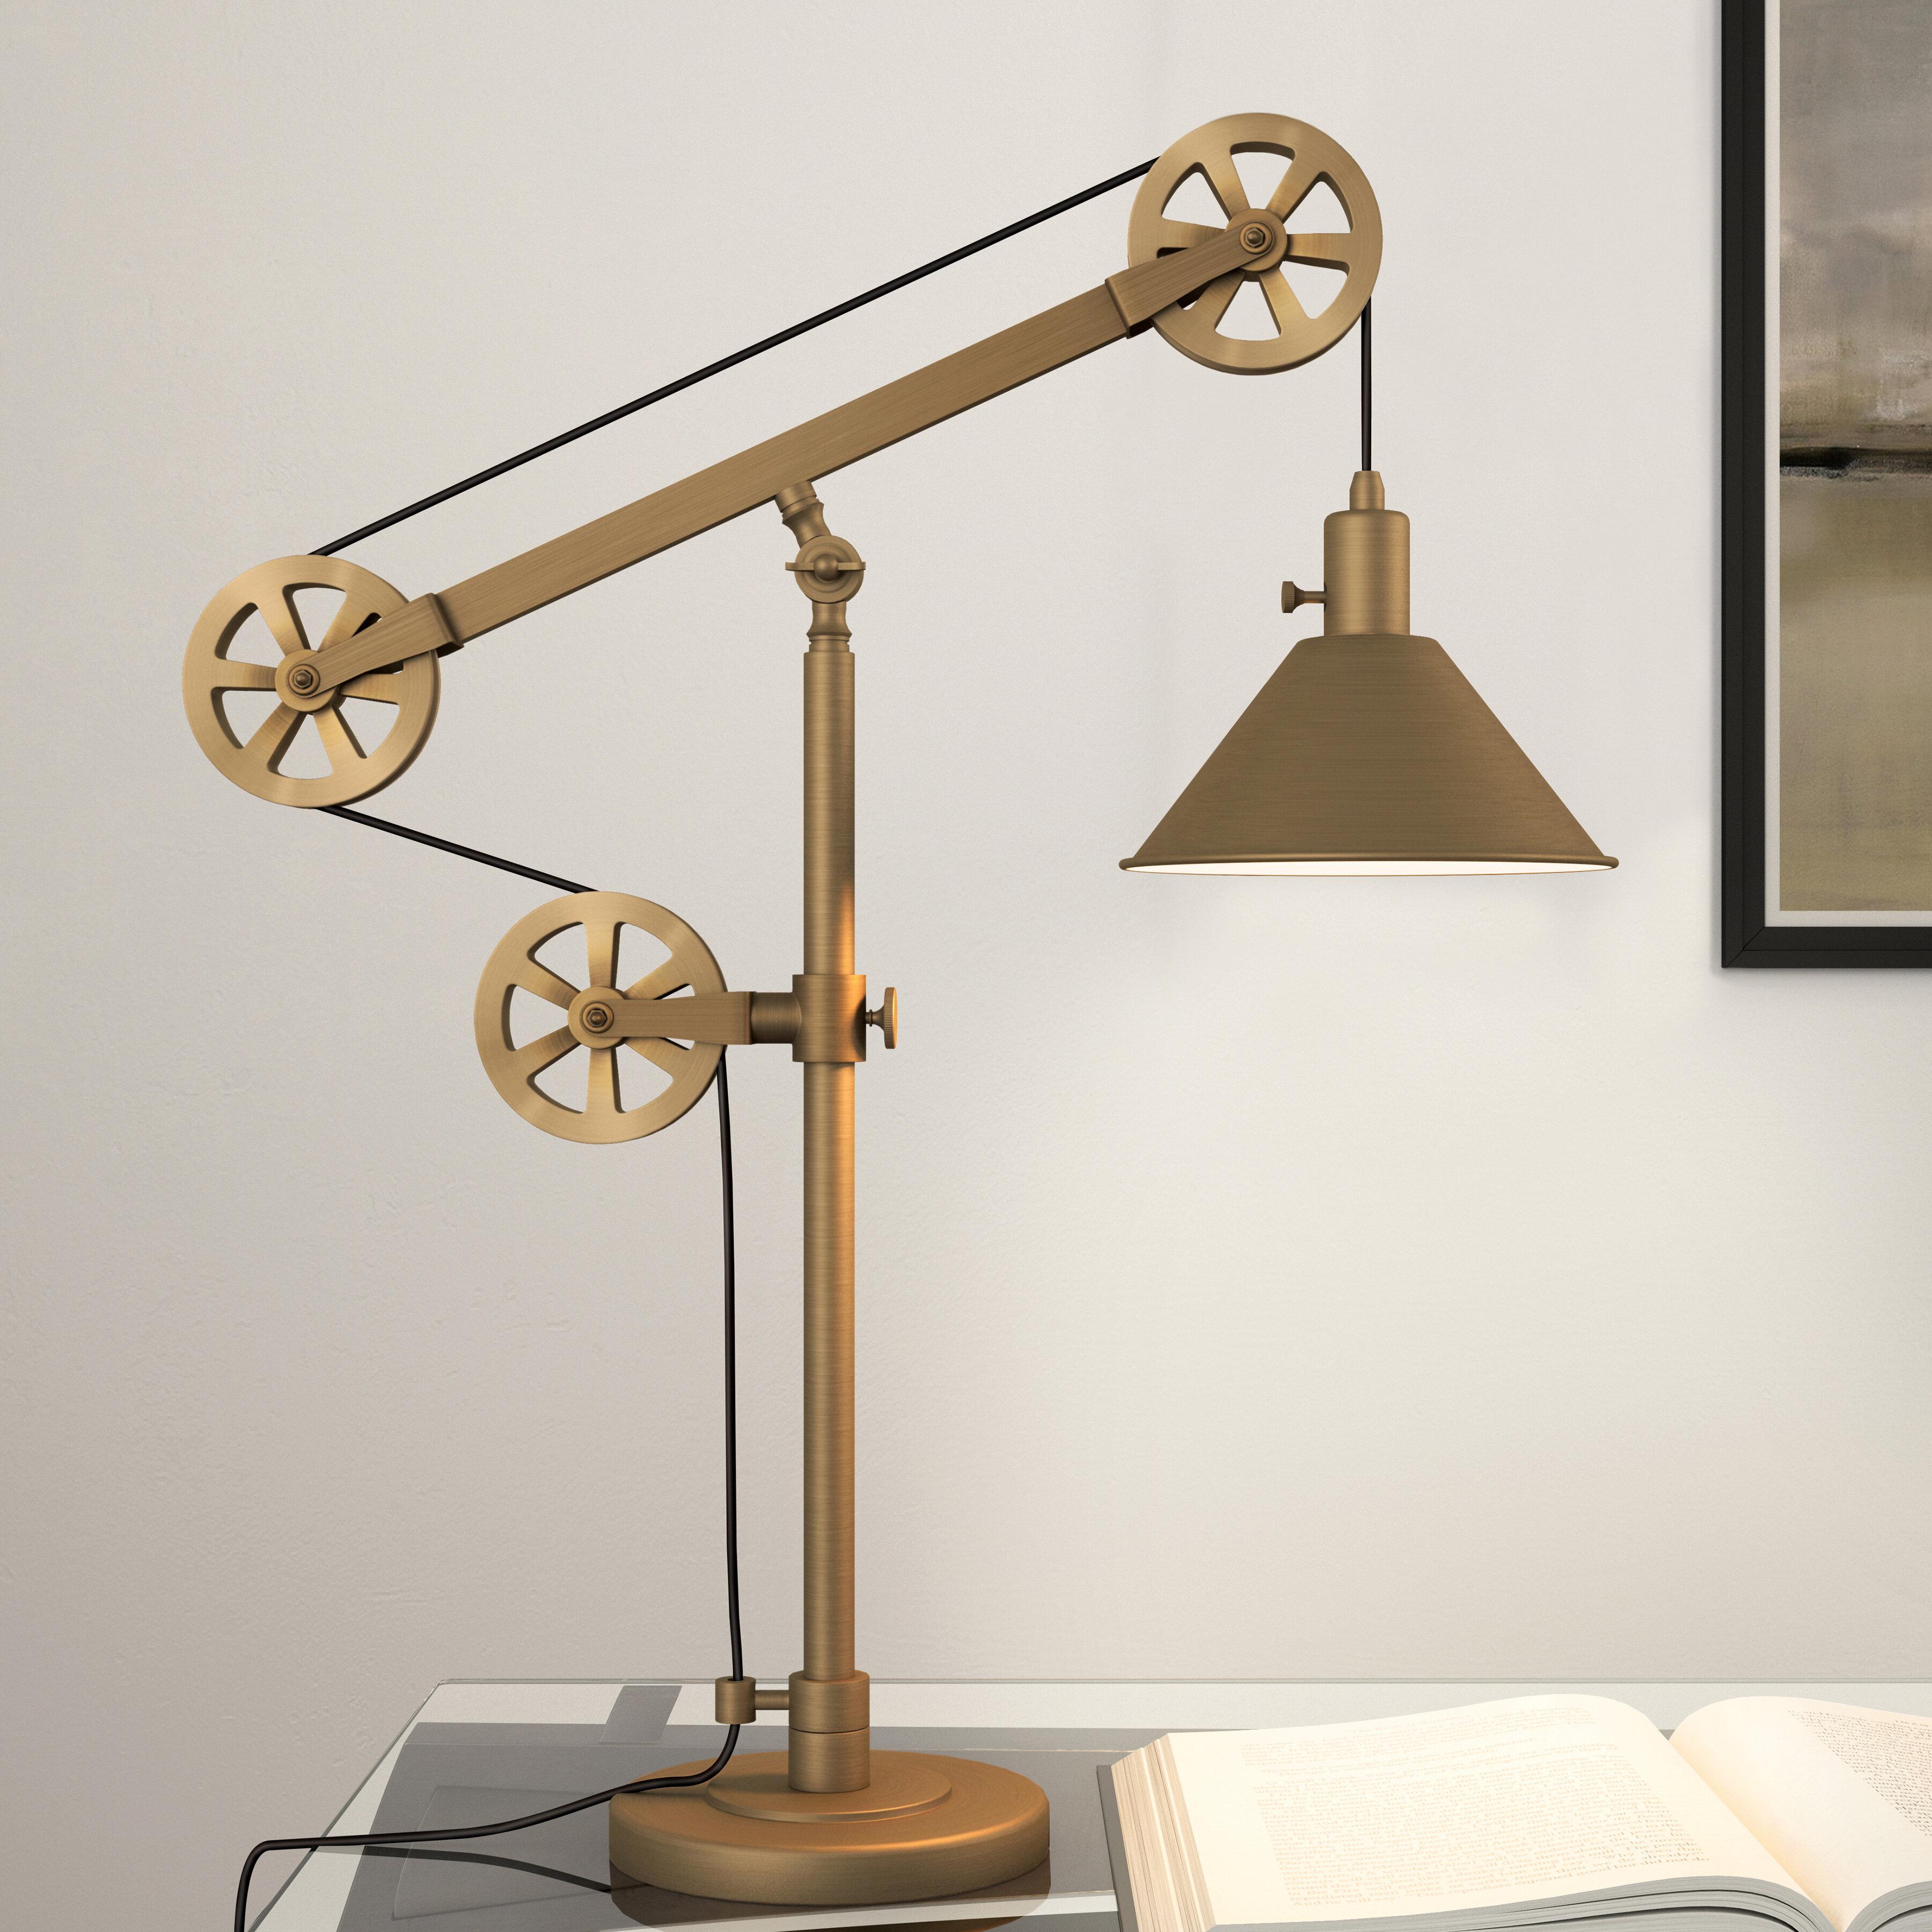 Industrial Table Lamps You Ll Love In 2020 Wayfair